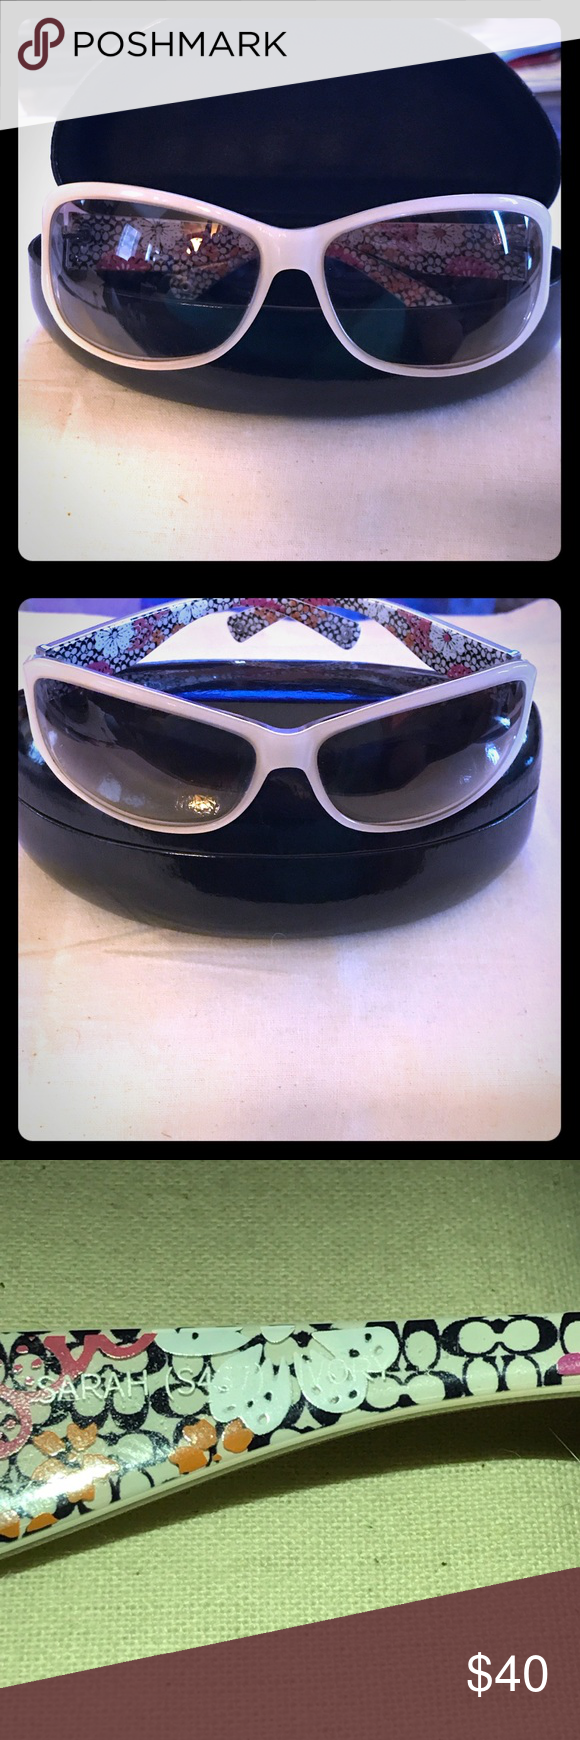 8d6b8b6a8a349 😎PRICE FIRM😎 Coach Sarah Sunglasses (Authentic) Sarah S437 Frame  Ivory  color